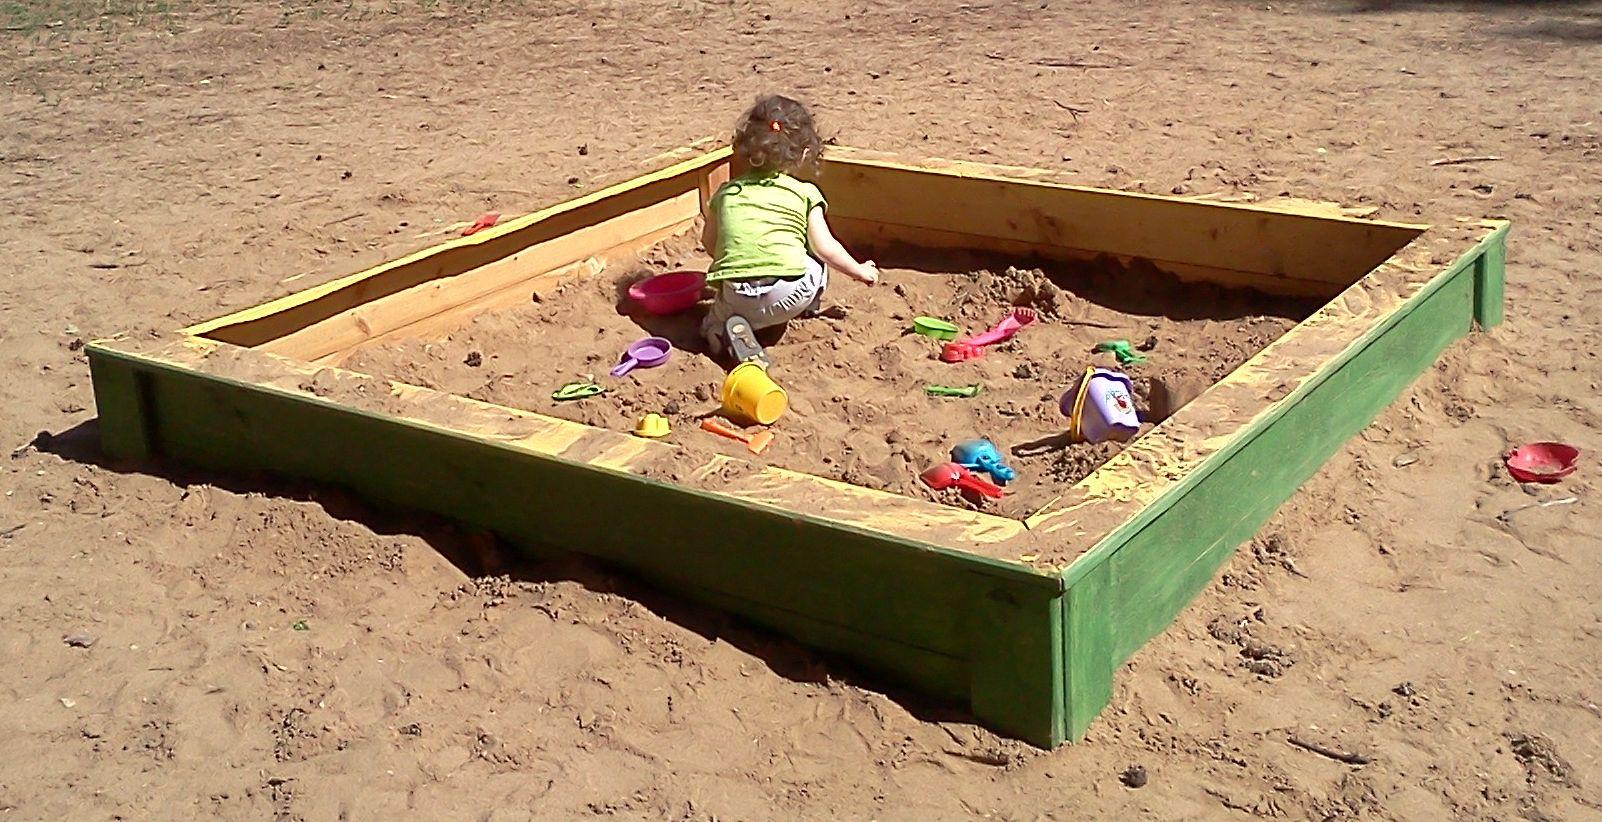 File:Sandbox-2013.jpg - Wikimedia Commons